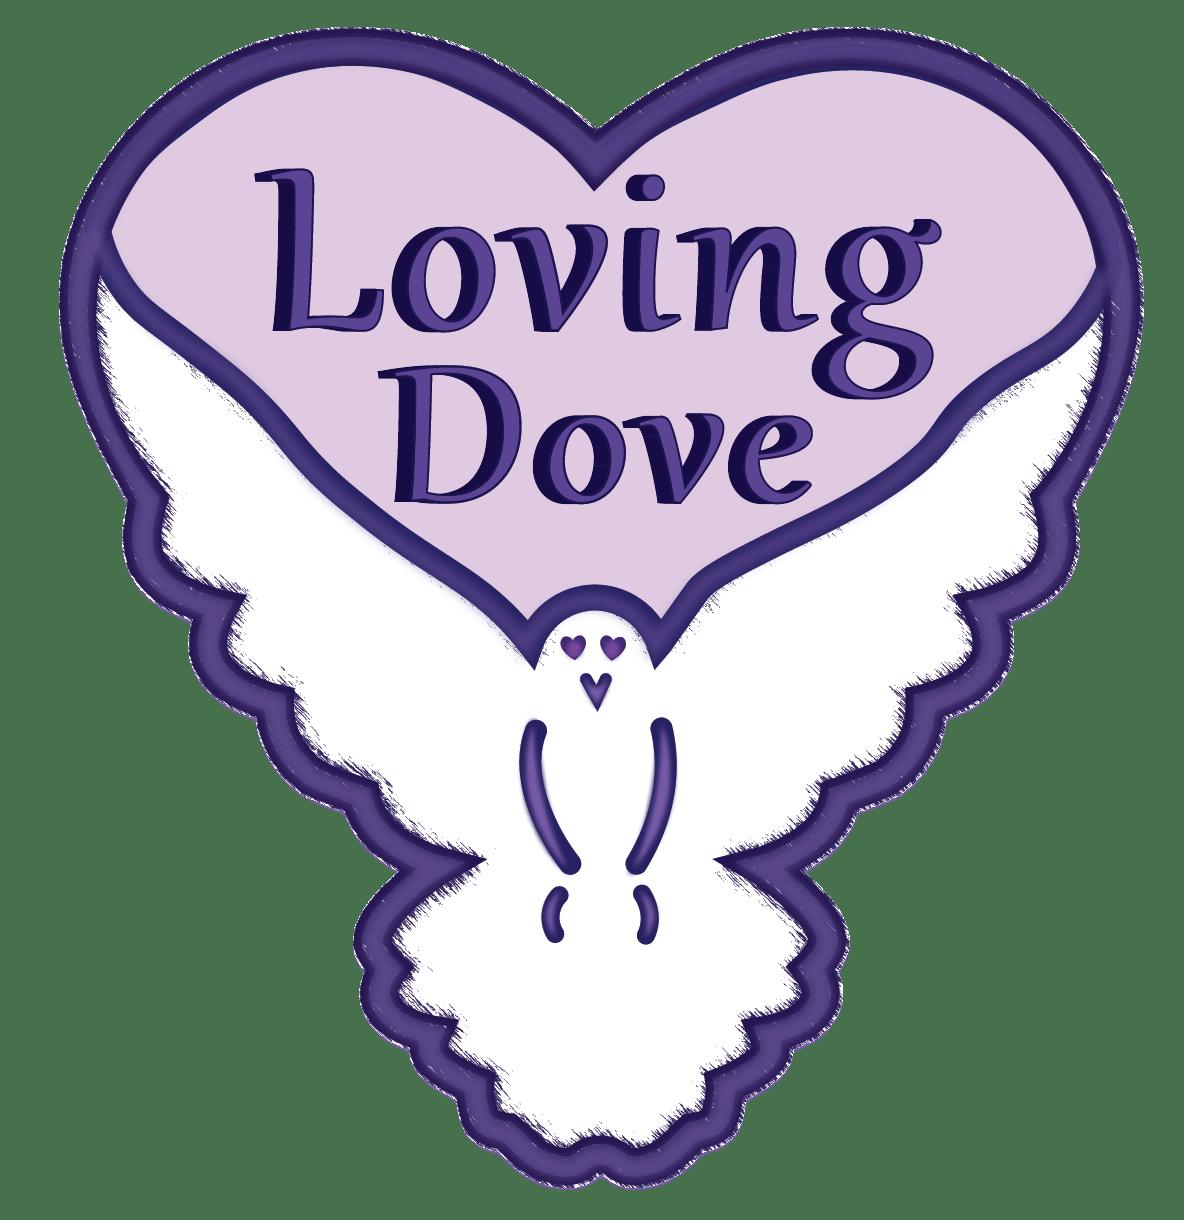 Loving Dove Farmasia